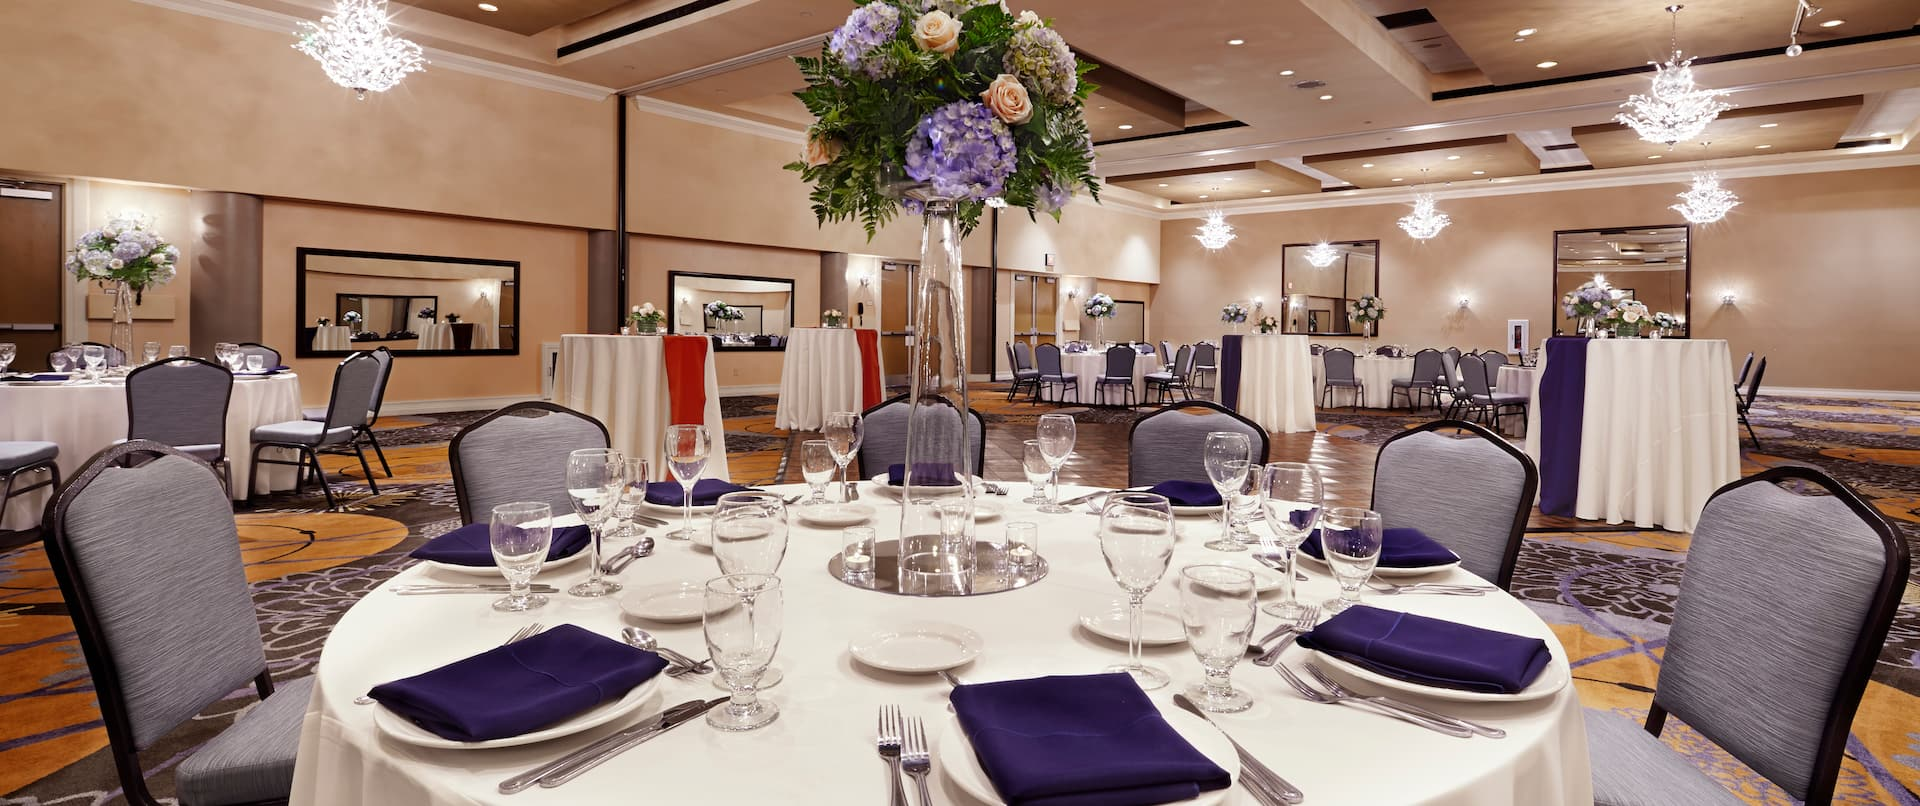 Lakeside Ballroom Wedding